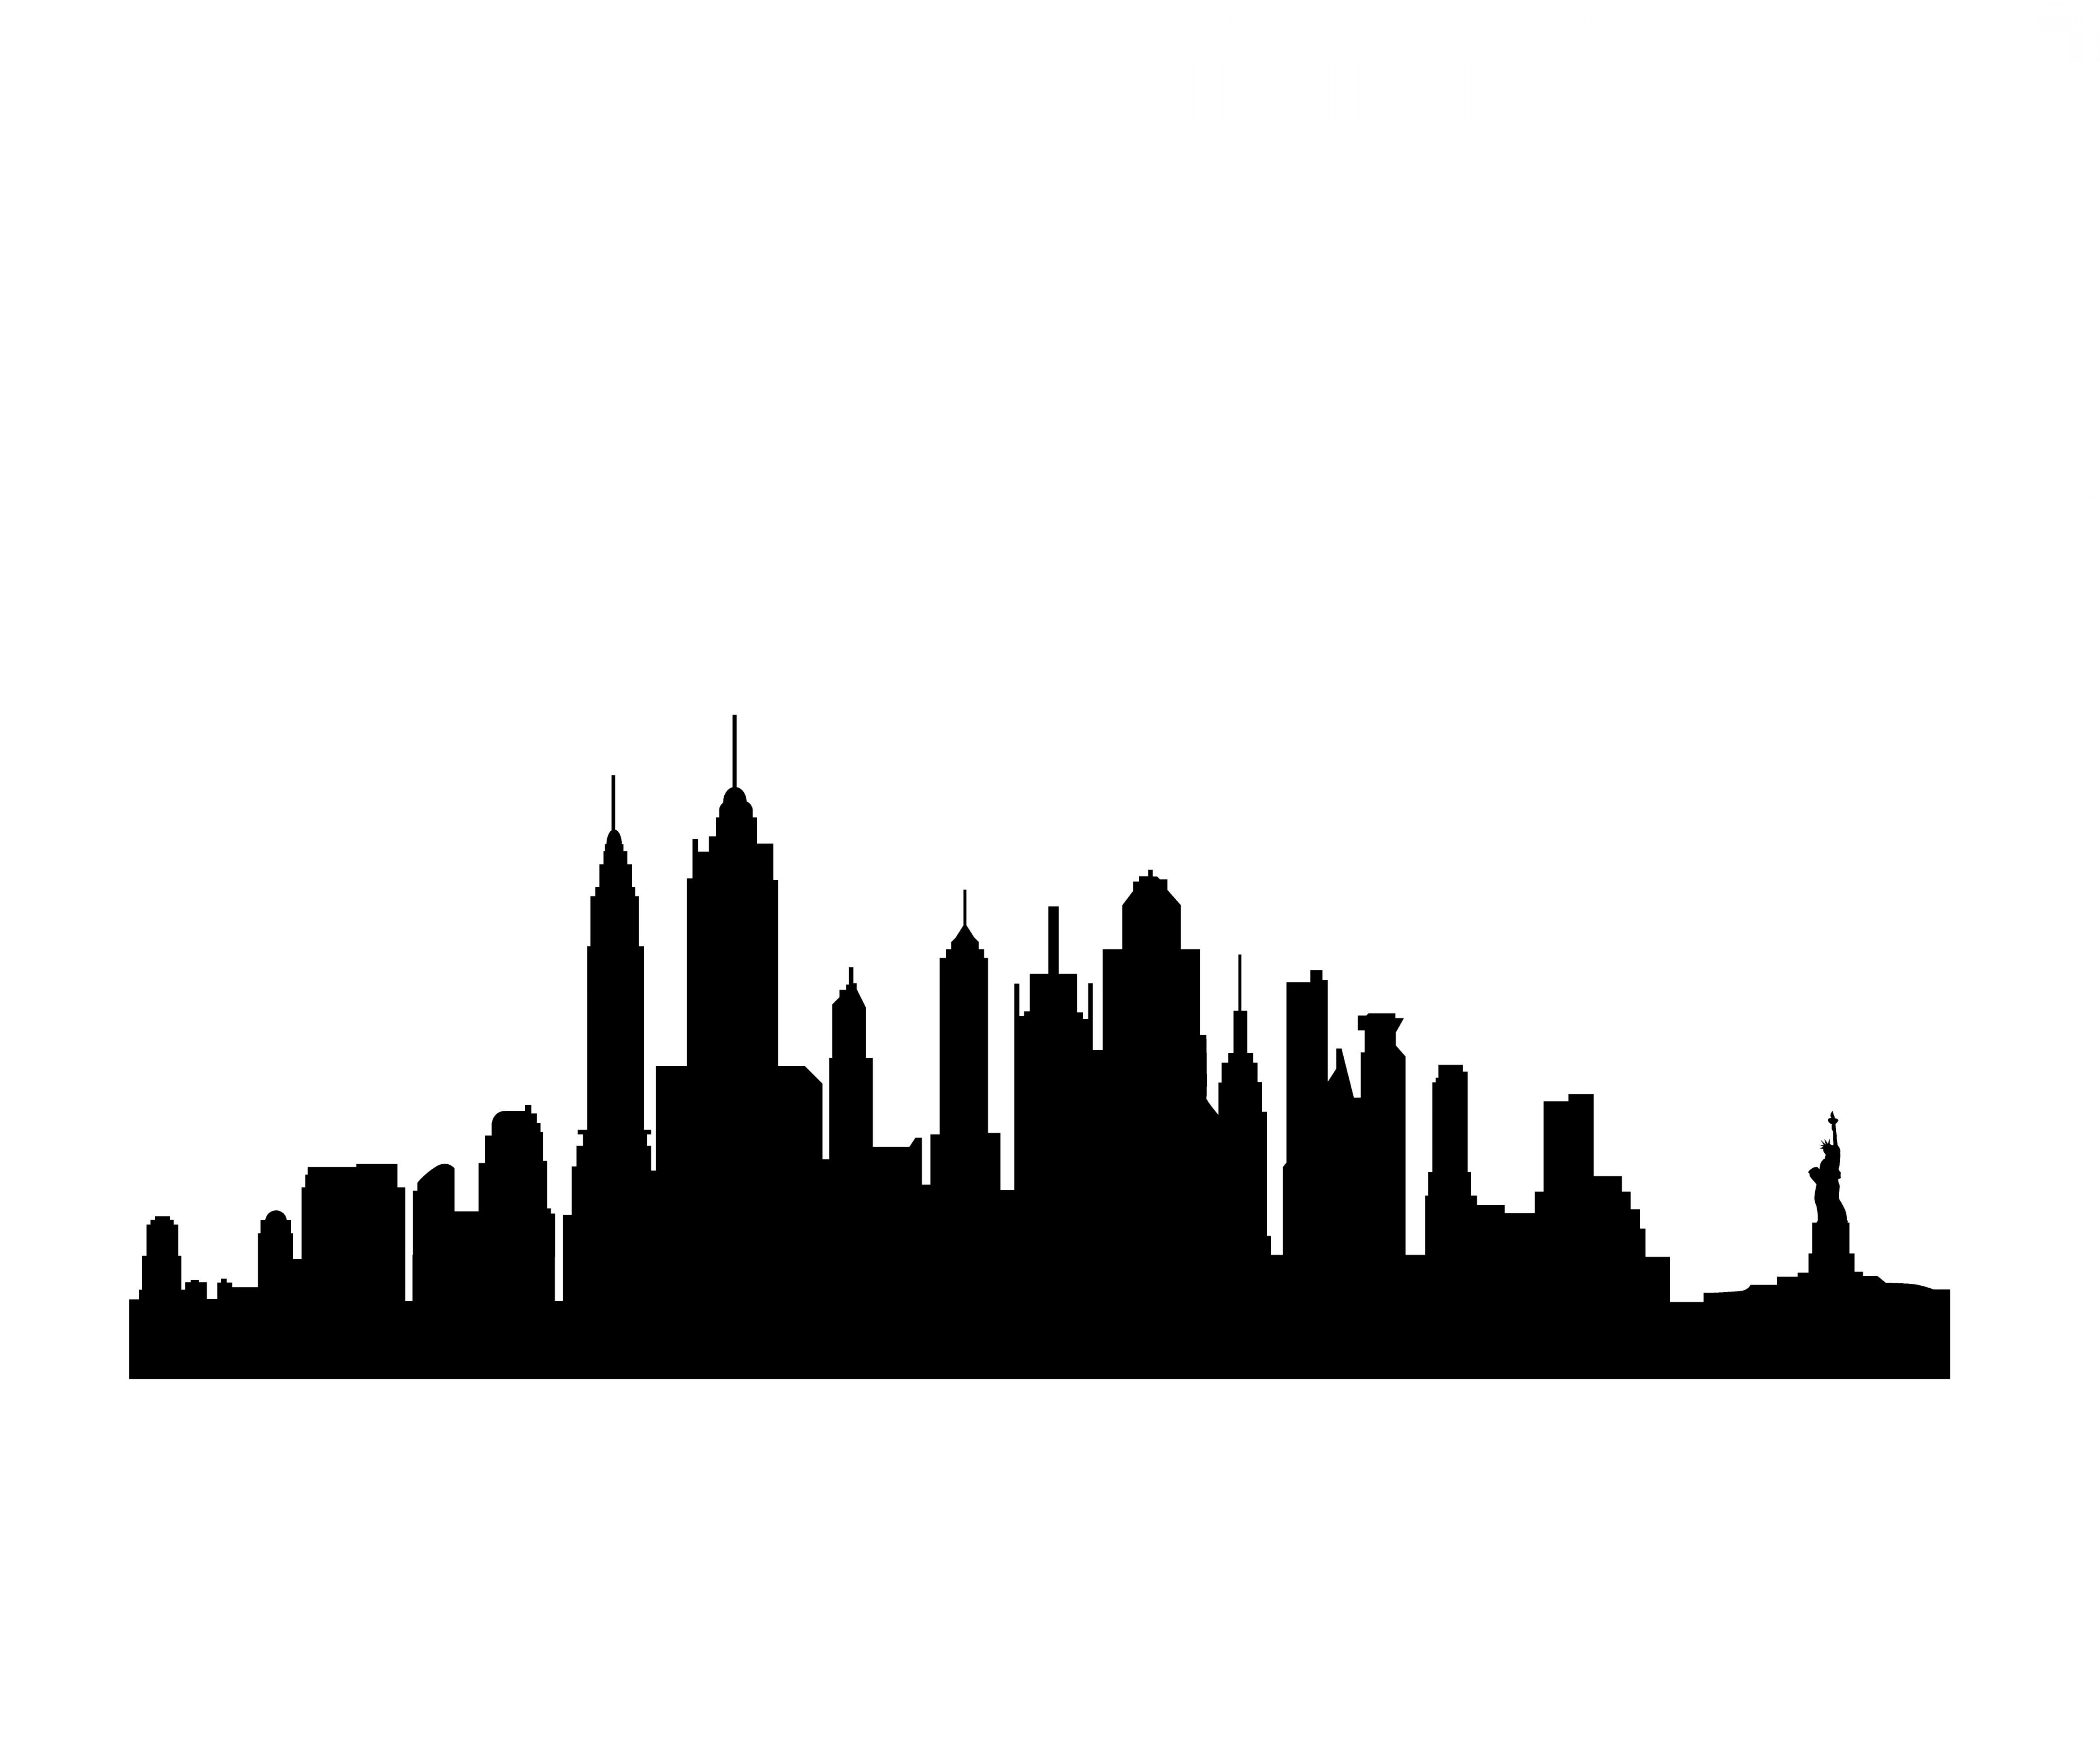 5184x4320 Free Clipart City Skyline